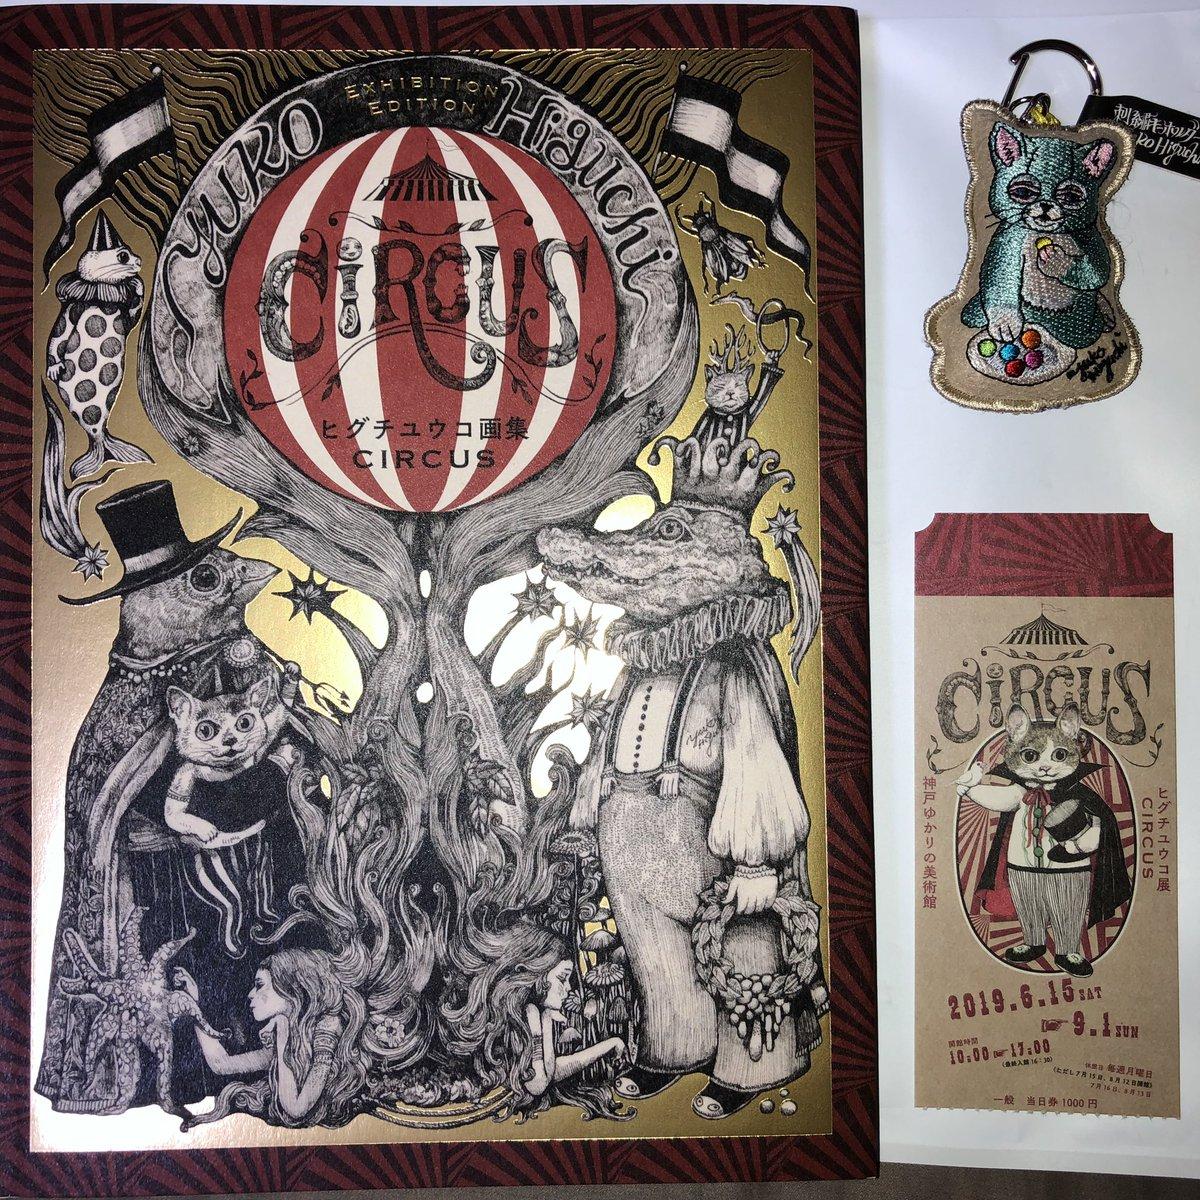 test ツイッターメディア - 温泉旅行からのヒグチユウコ展行ってきたー!!画集と刺繍キーホルダーを買った🎶最高に可愛いかった、、、❤😭 https://t.co/KZZPkzYQKM